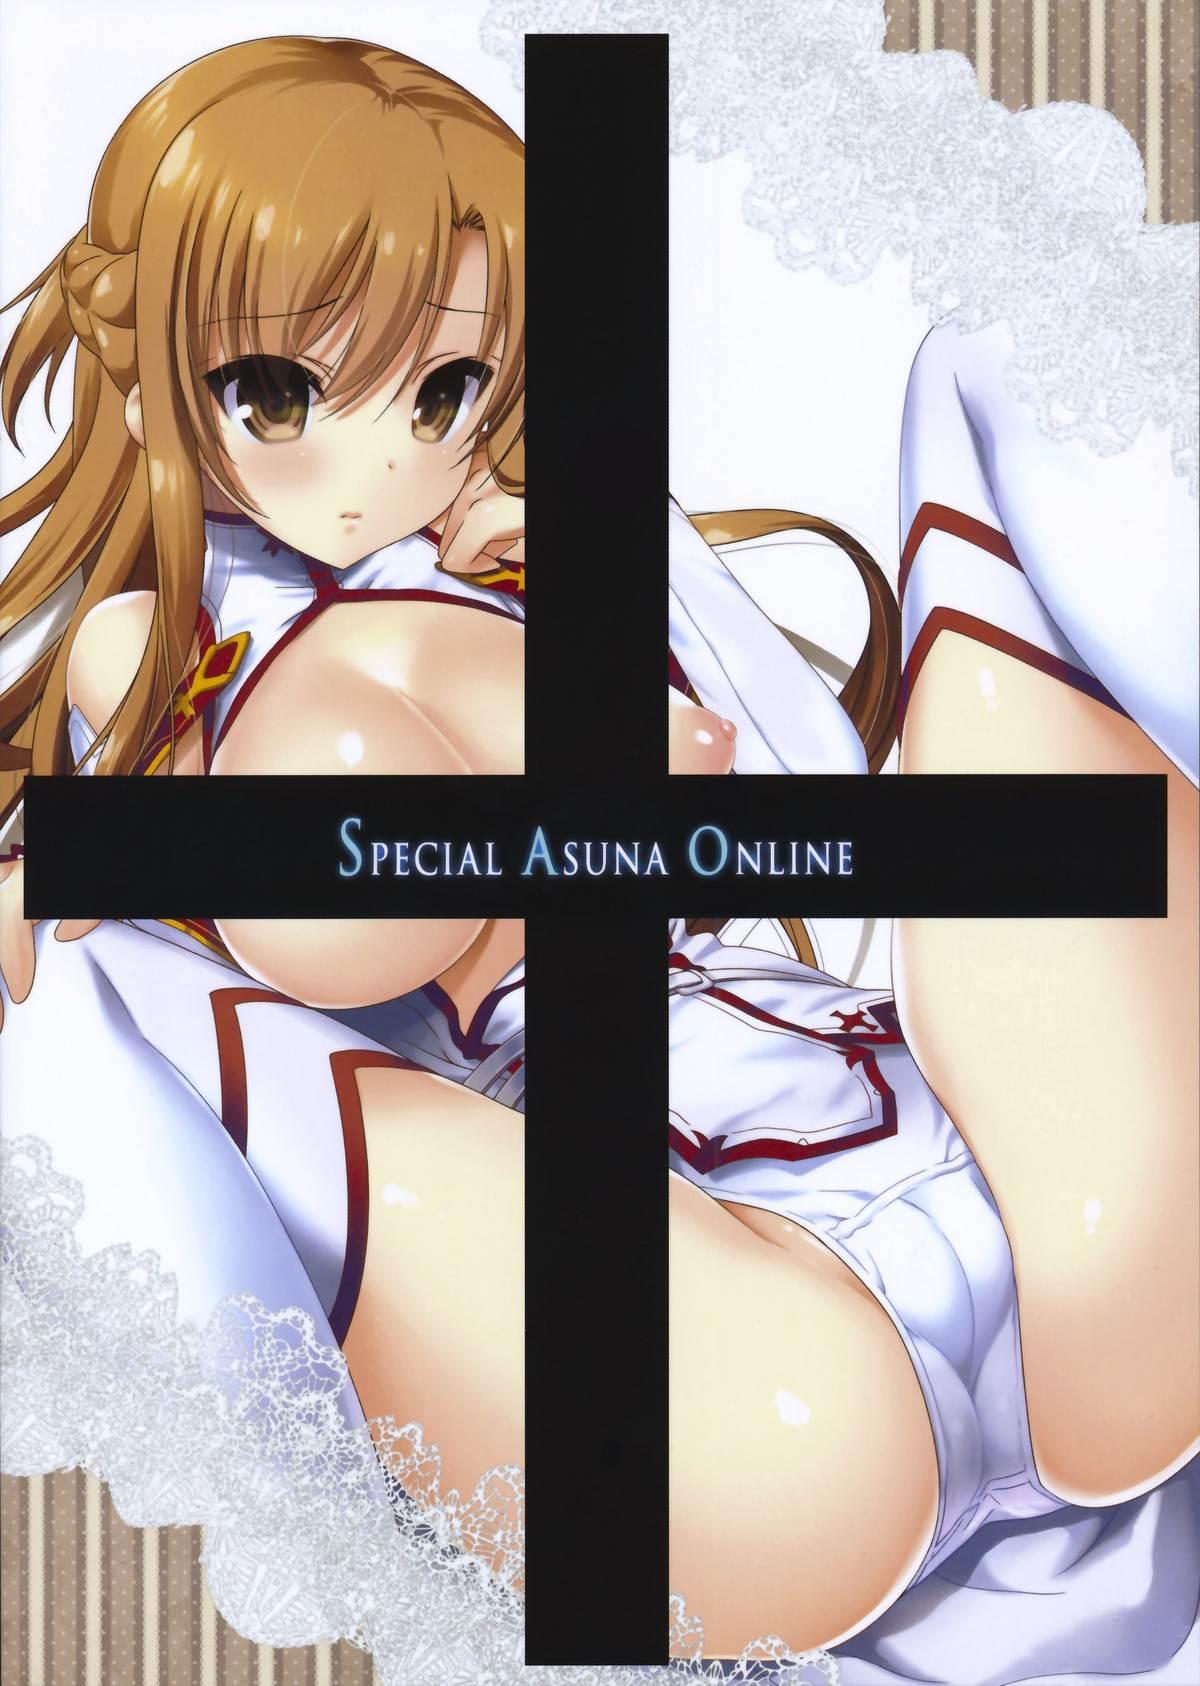 SPECIAL ASUNA ONLINE 1